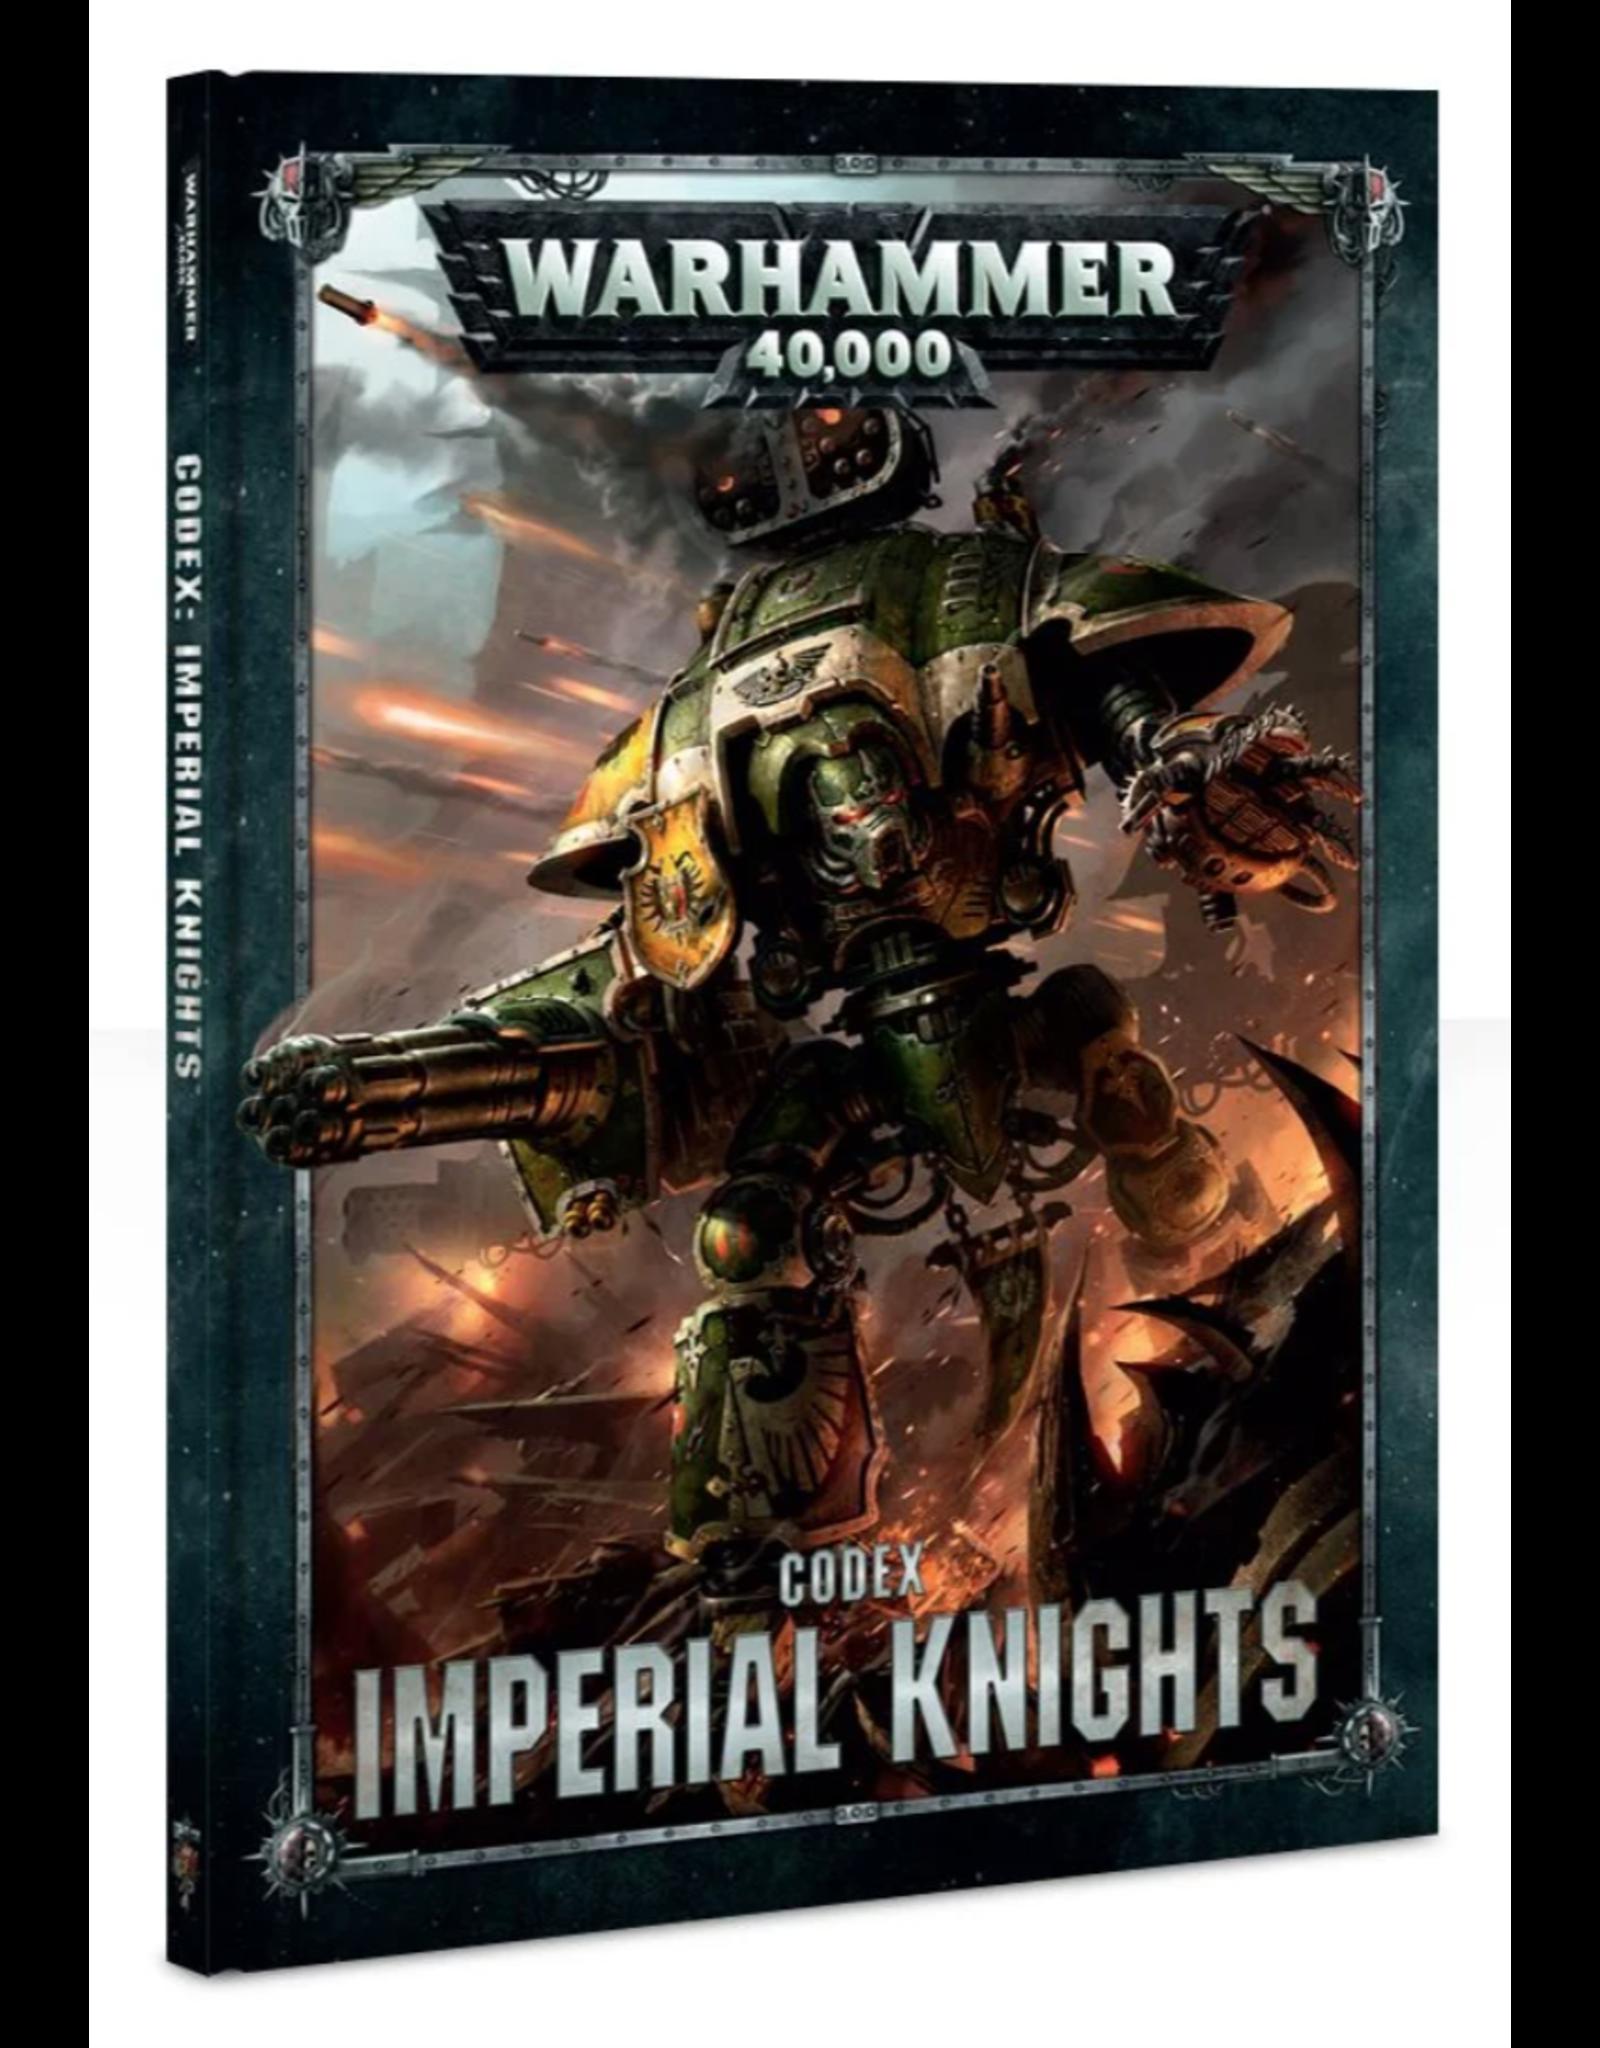 Warhammer 40K Codex: Imperial Knights